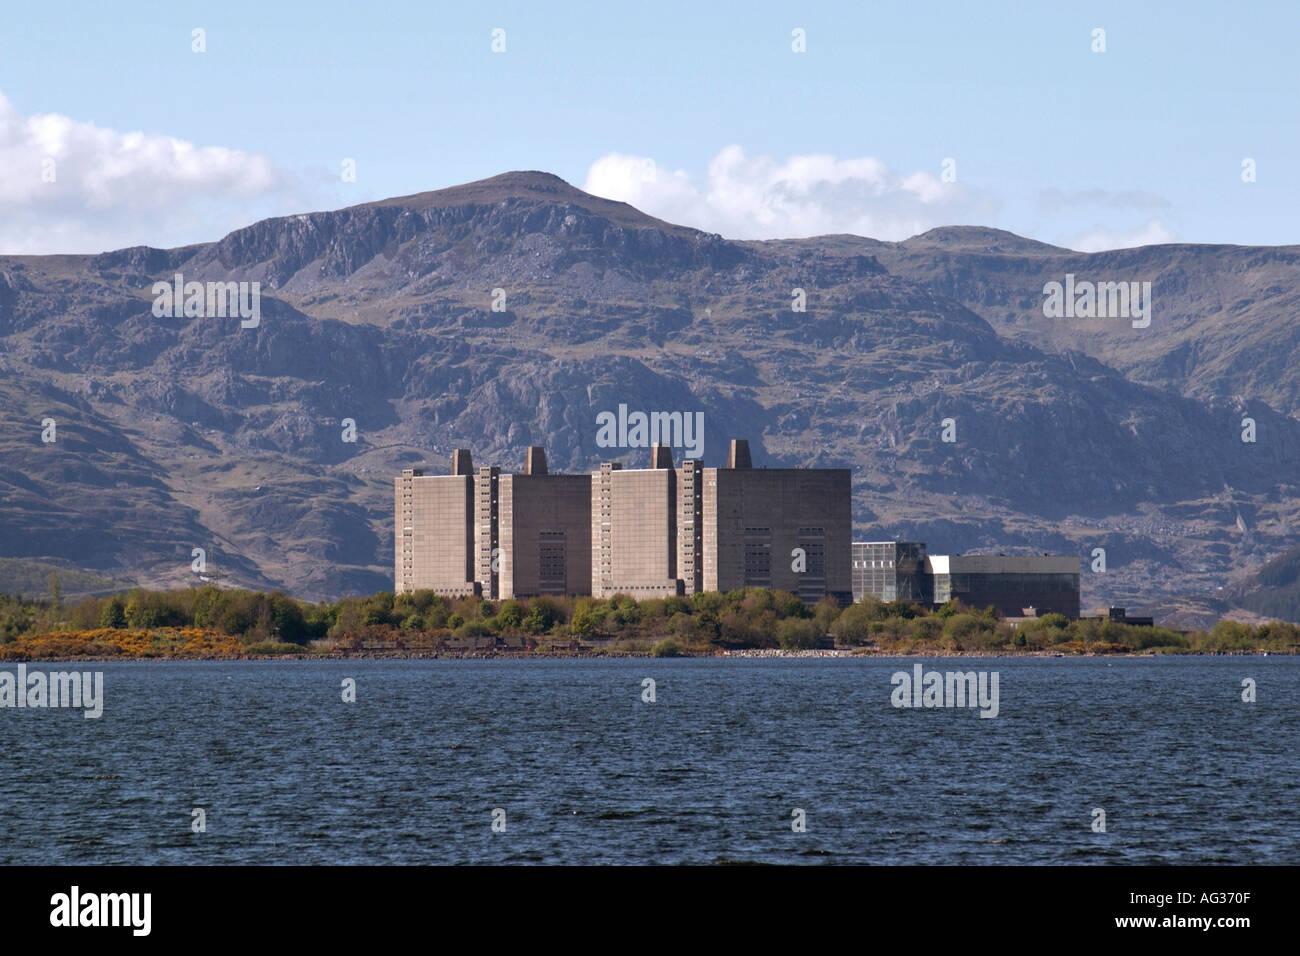 Trawsfynydd nuclear power station Gwynedd North Wales UK GB viewed over lake toward mountain range Stock Photo